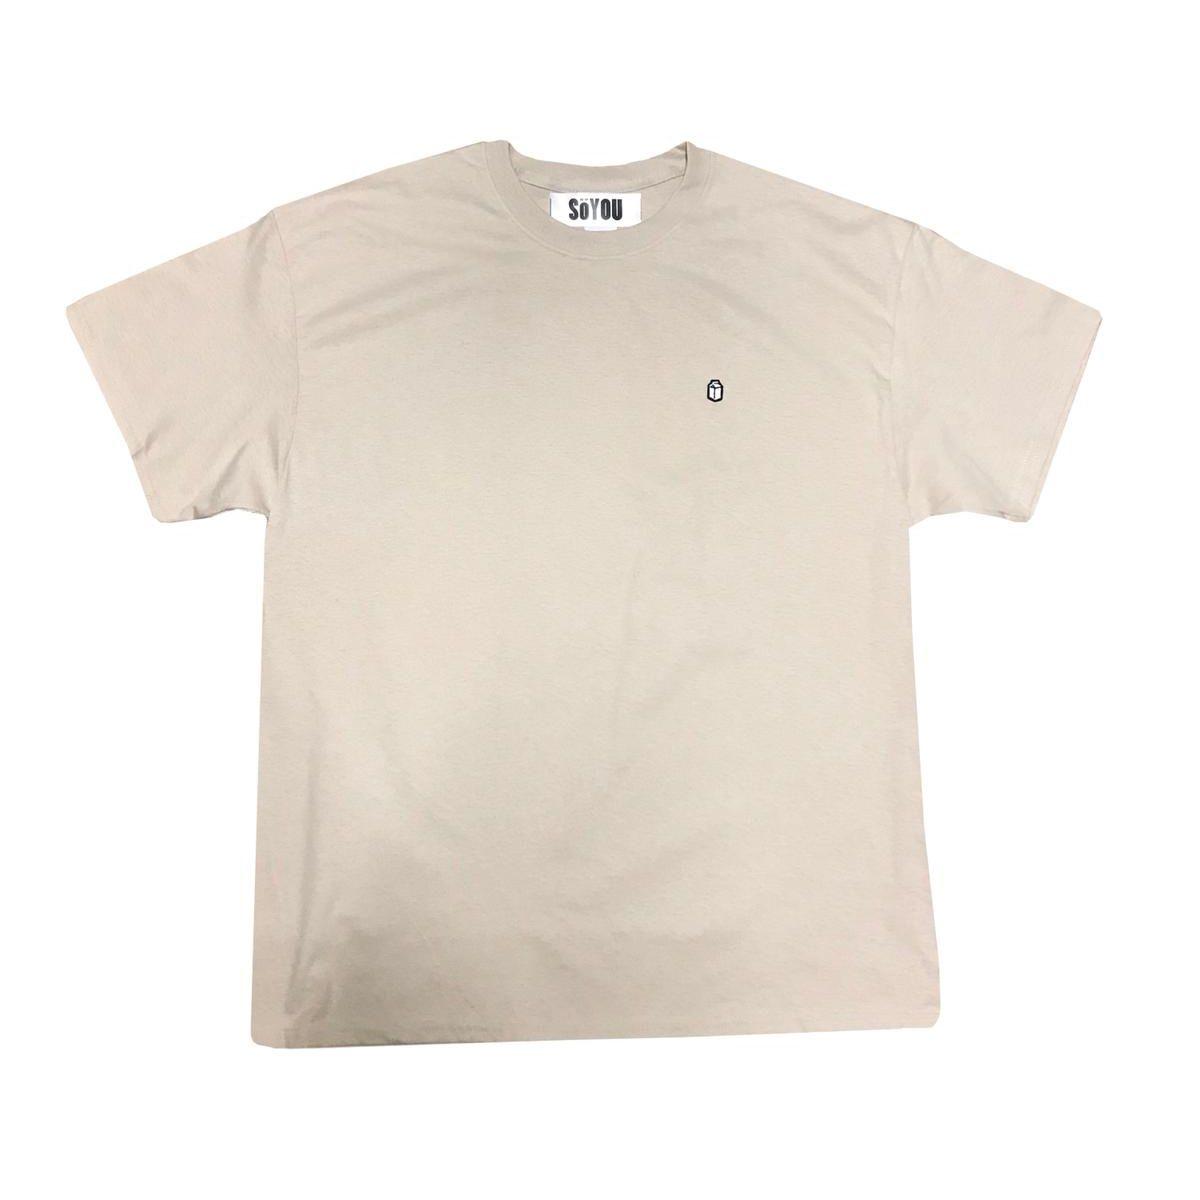 SoYou Clothing Basics T-Shirt in Beige